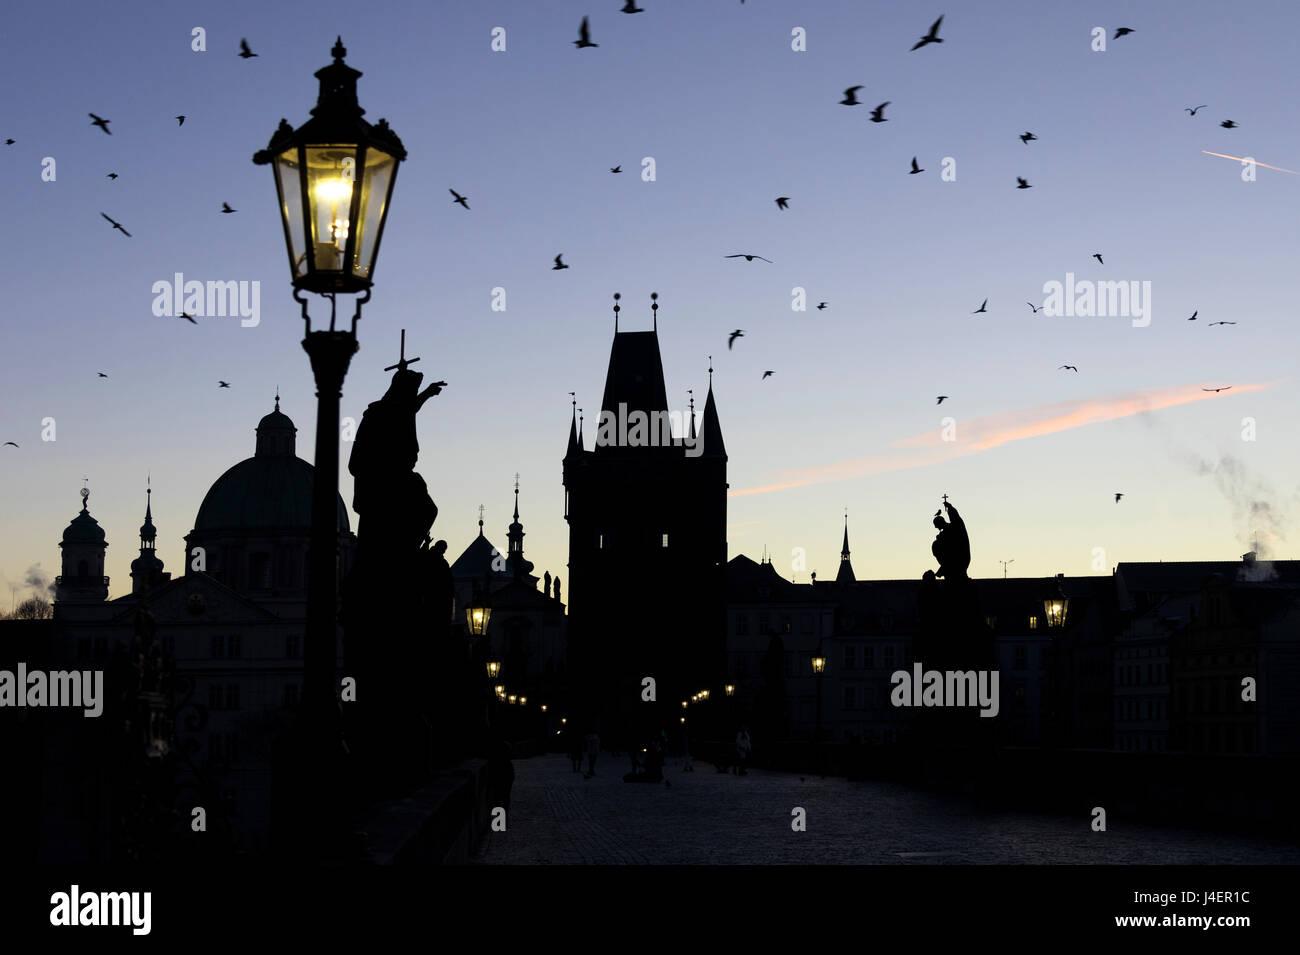 A flock of birds flies on the historical Charles Bridge on Vltava River at dawn, UNESCO, Prague, Czech Republic - Stock Image